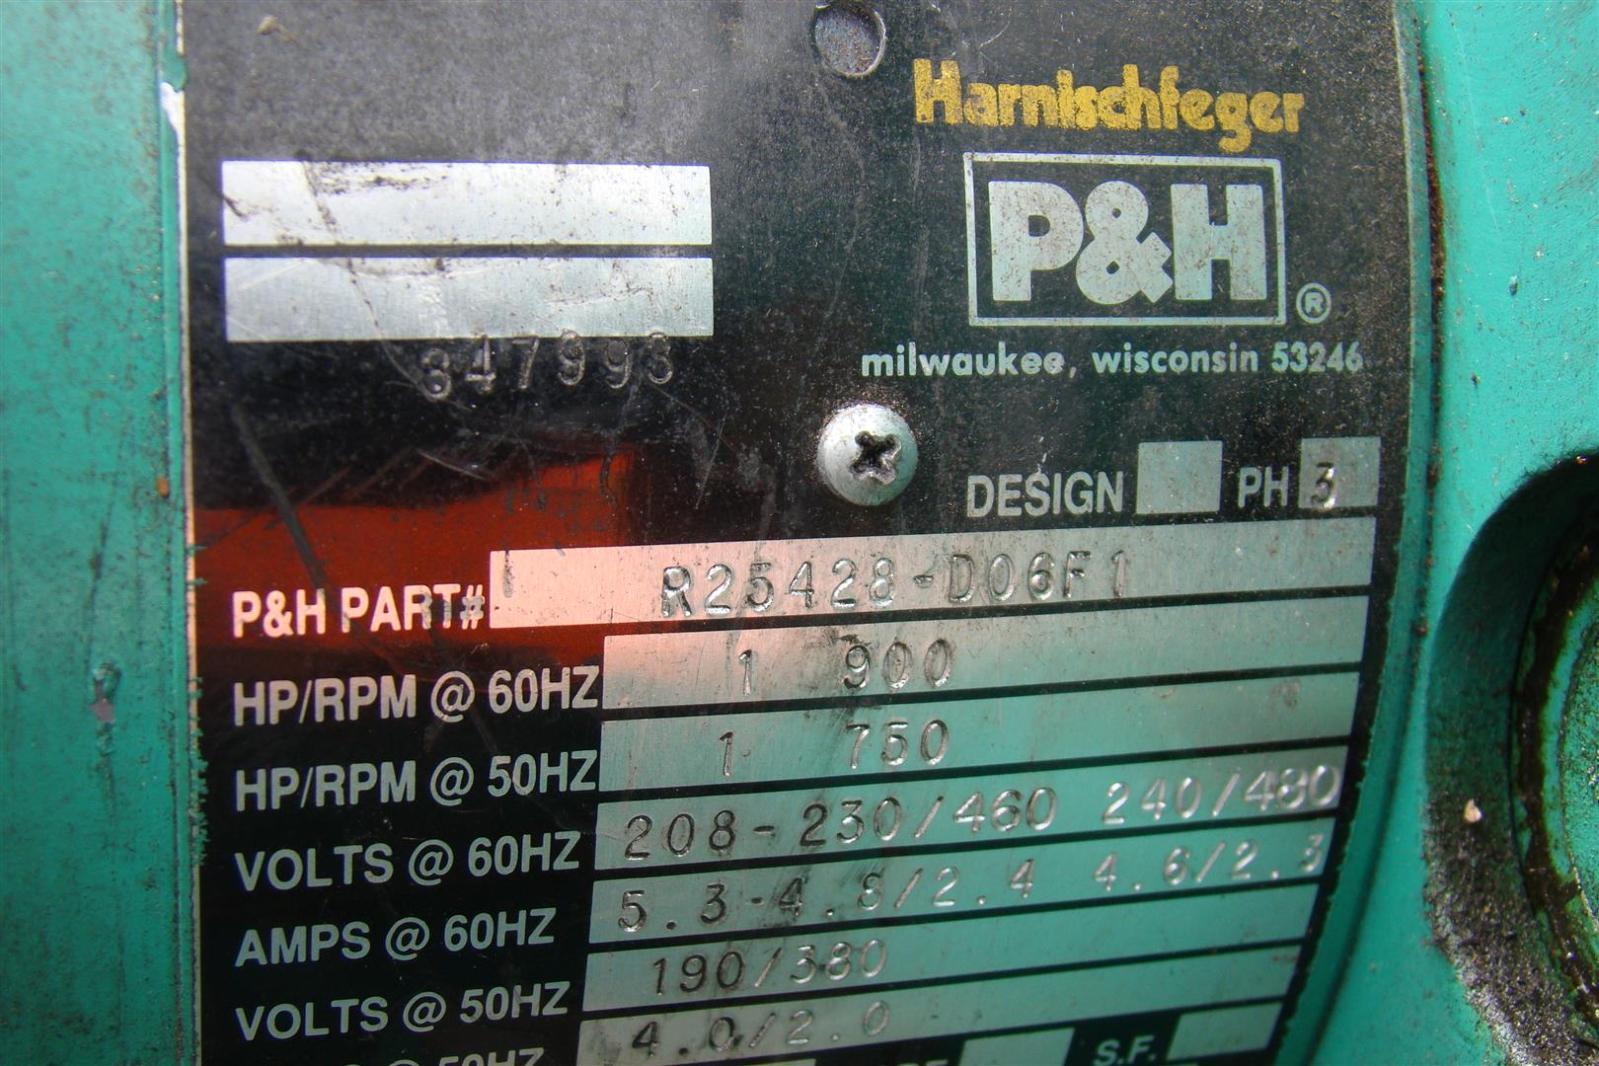 P H Crane Wiring Diagram Experts Of Hoist Morris Electric Chain S3 Hoists High Rh Bungaairmatapengantinantigononflavescensseger 110 Power